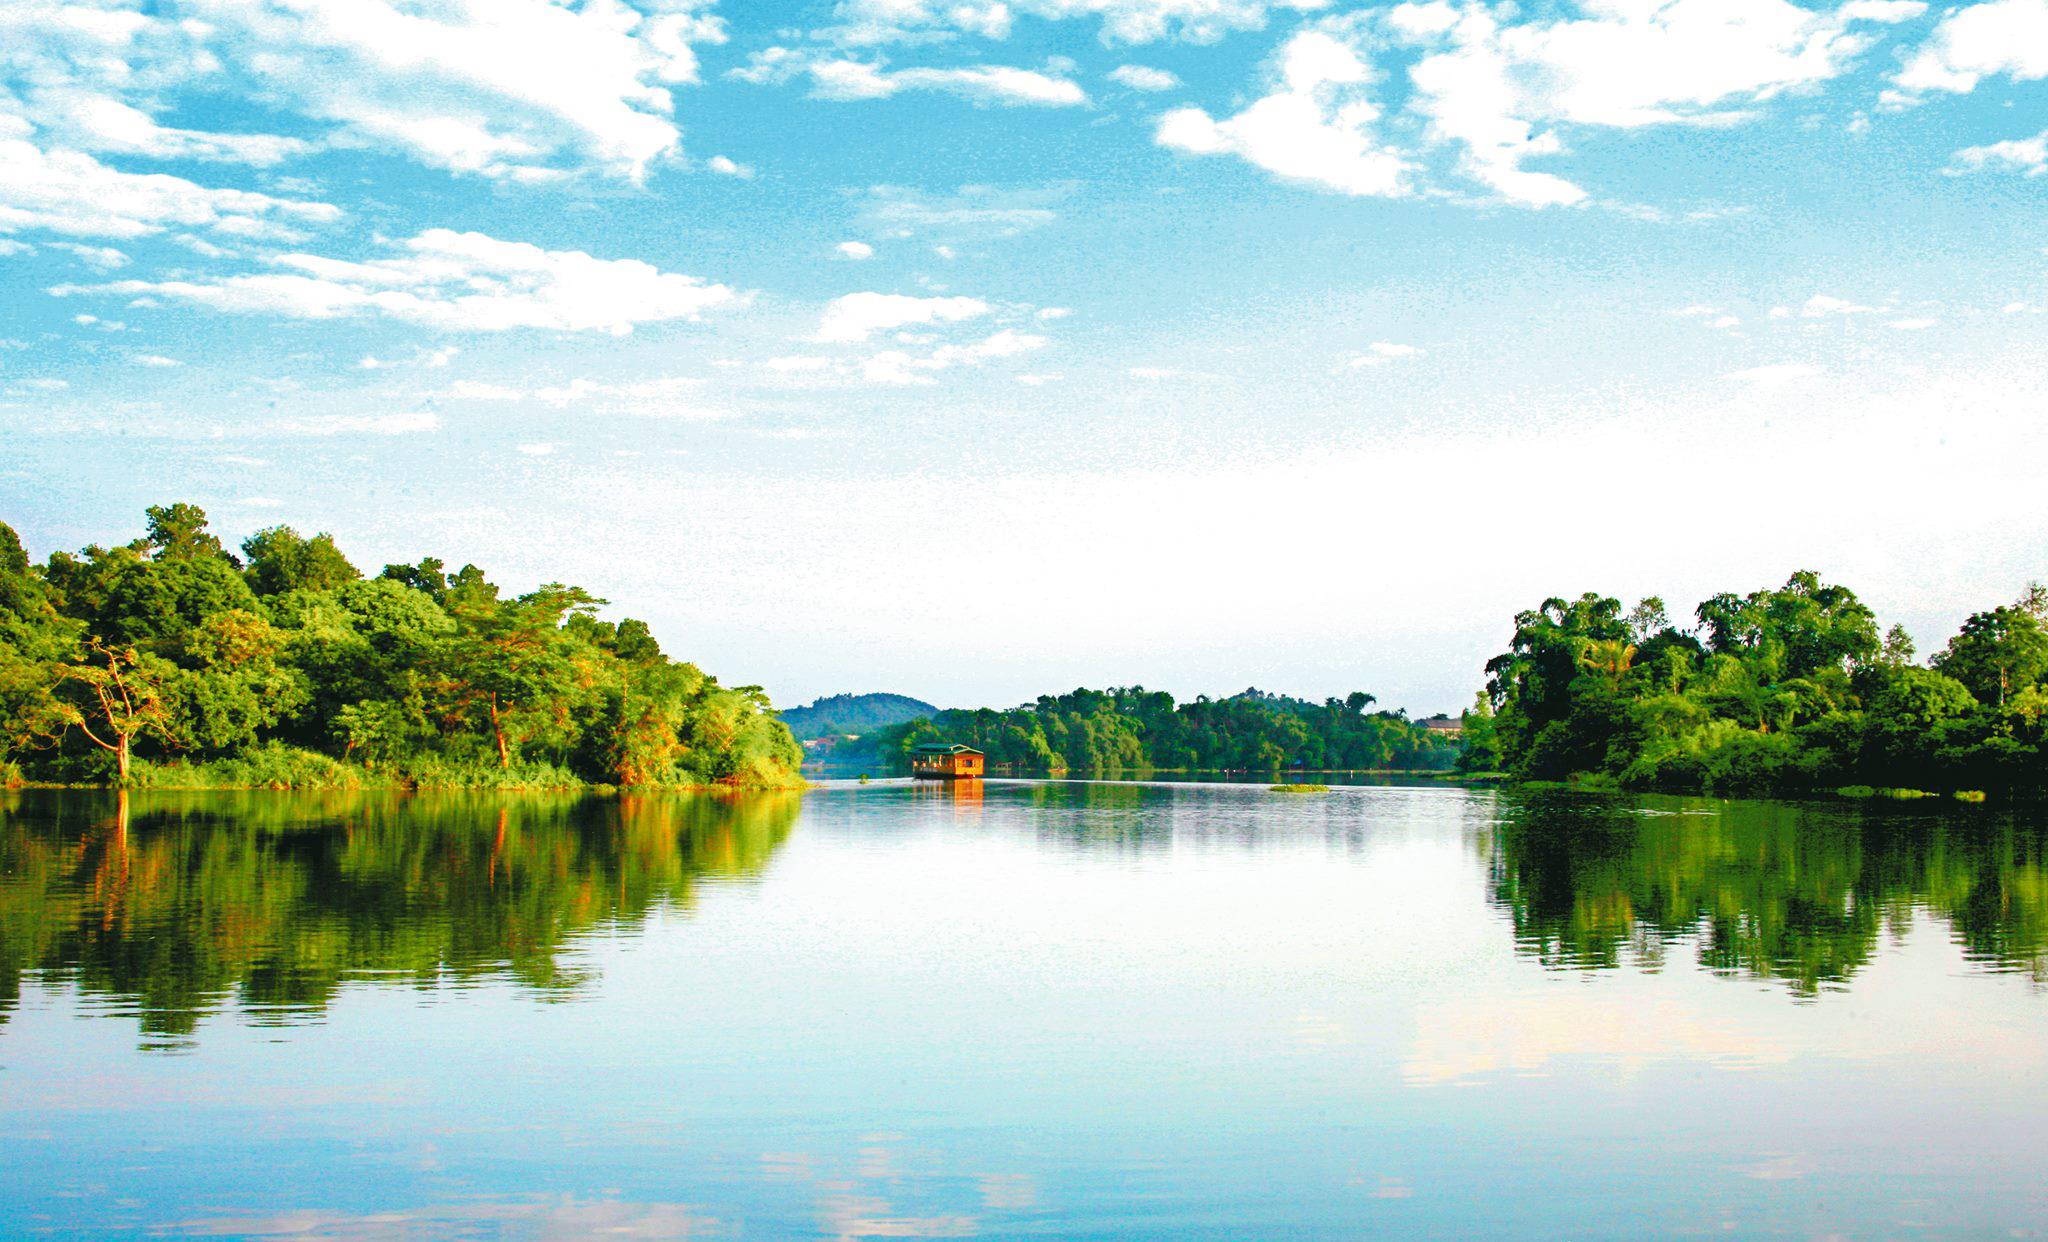 du lịch Phú Thọ 14